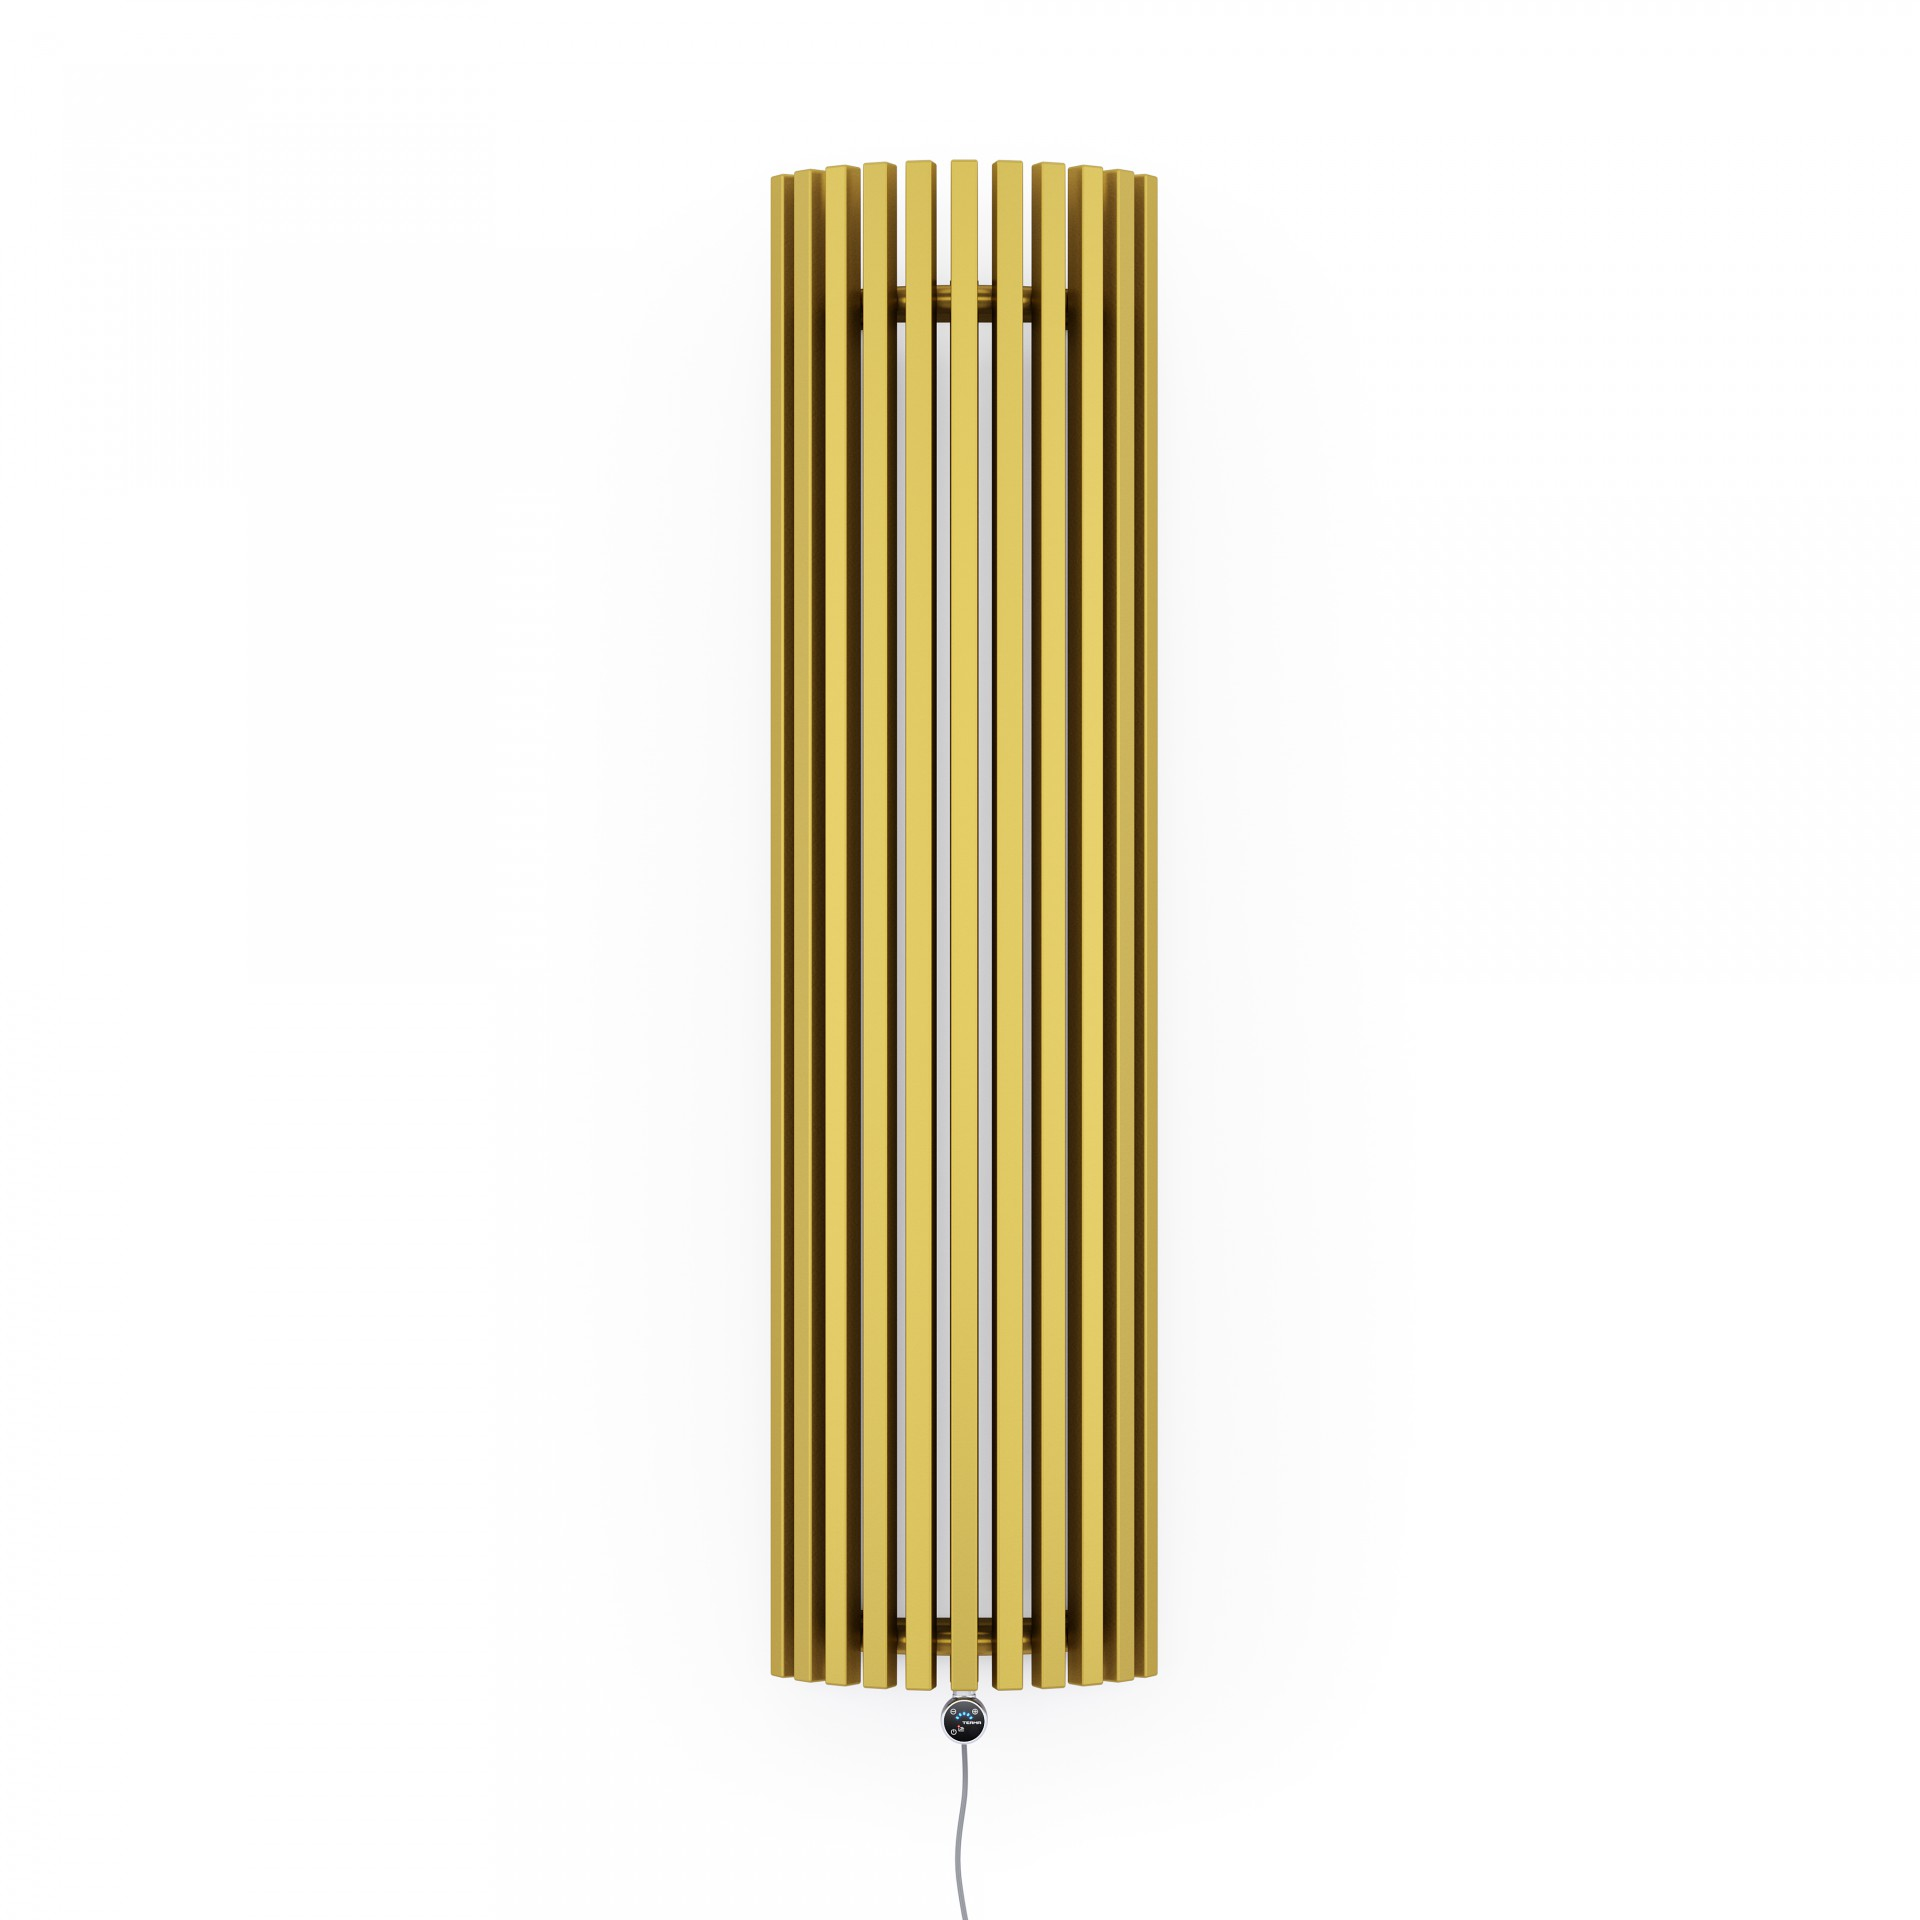 Colour: Gold Gloss (GPO)